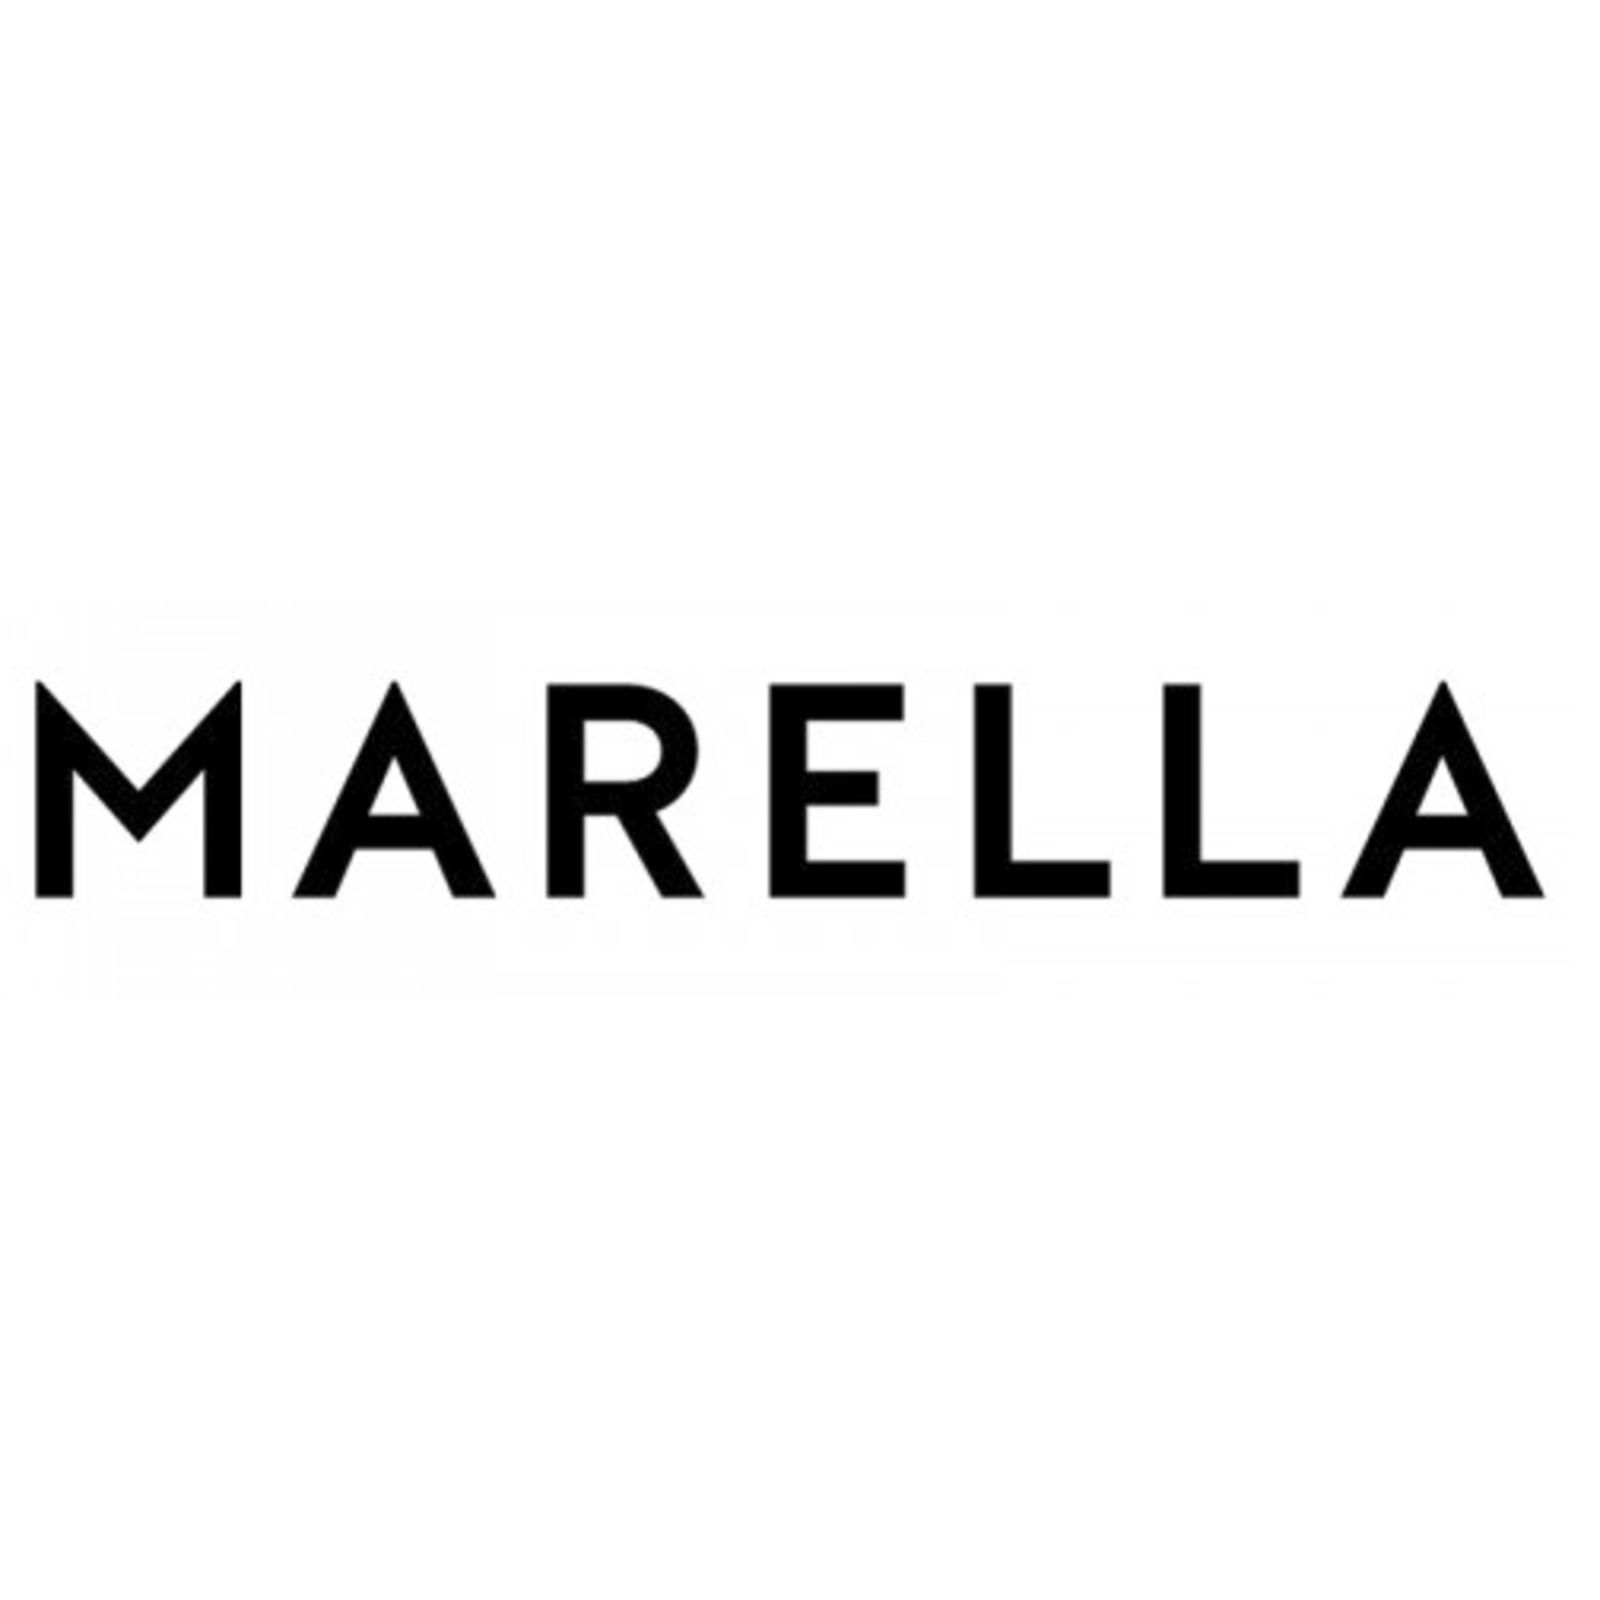 MARELLA (Image 1)